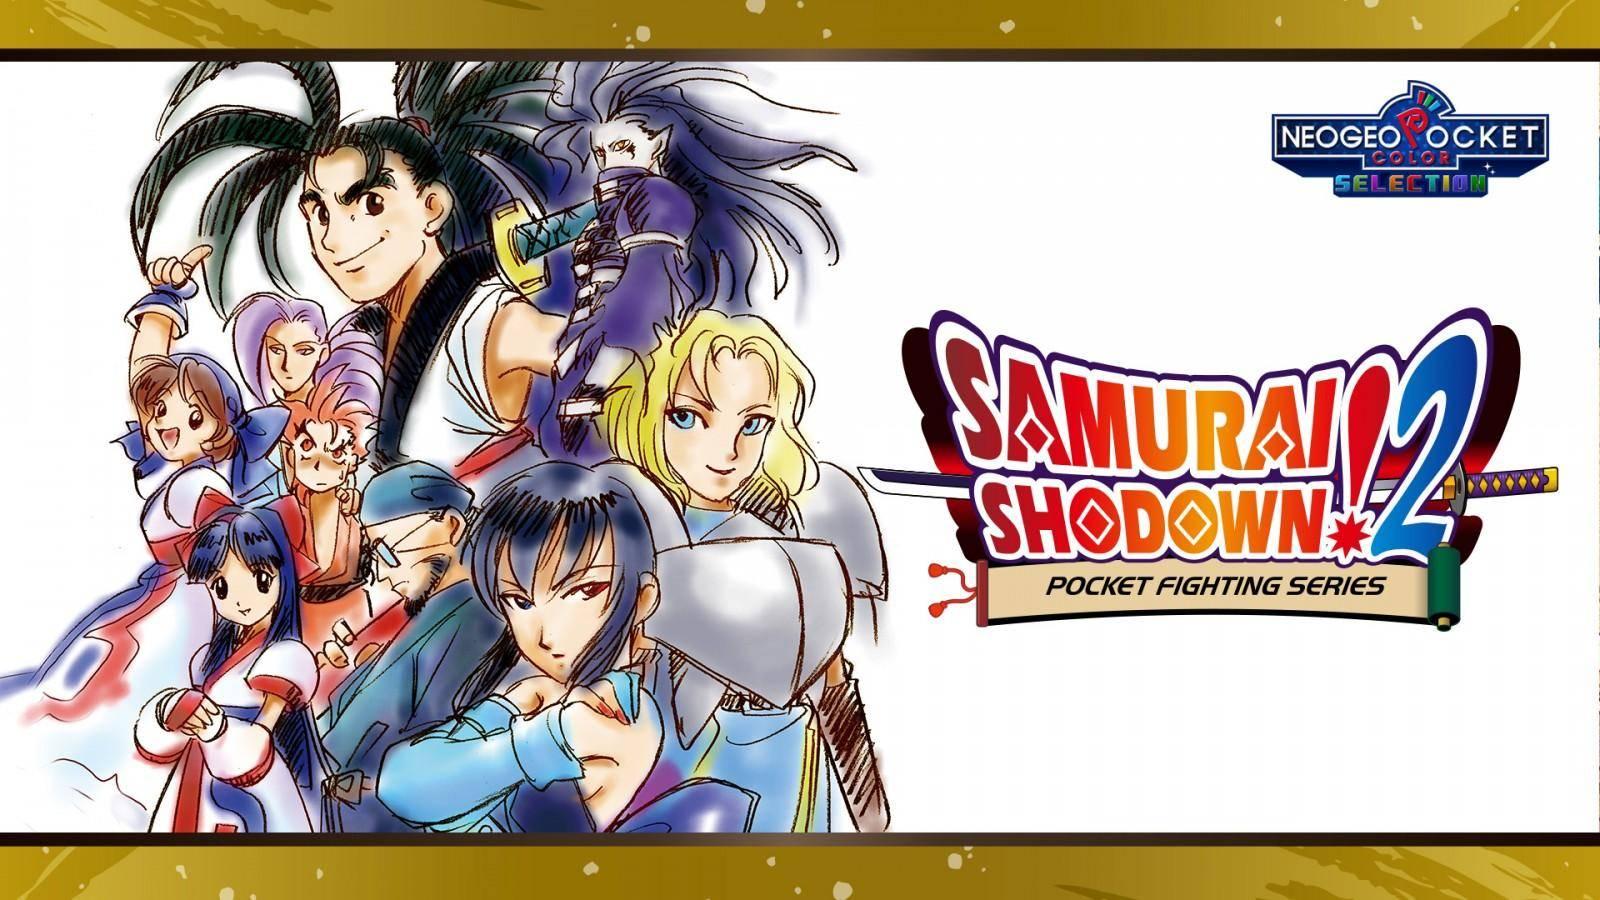 King Of Fighters R-2 y Samurai Shodown 2 llegan a Nintendo Switch 6